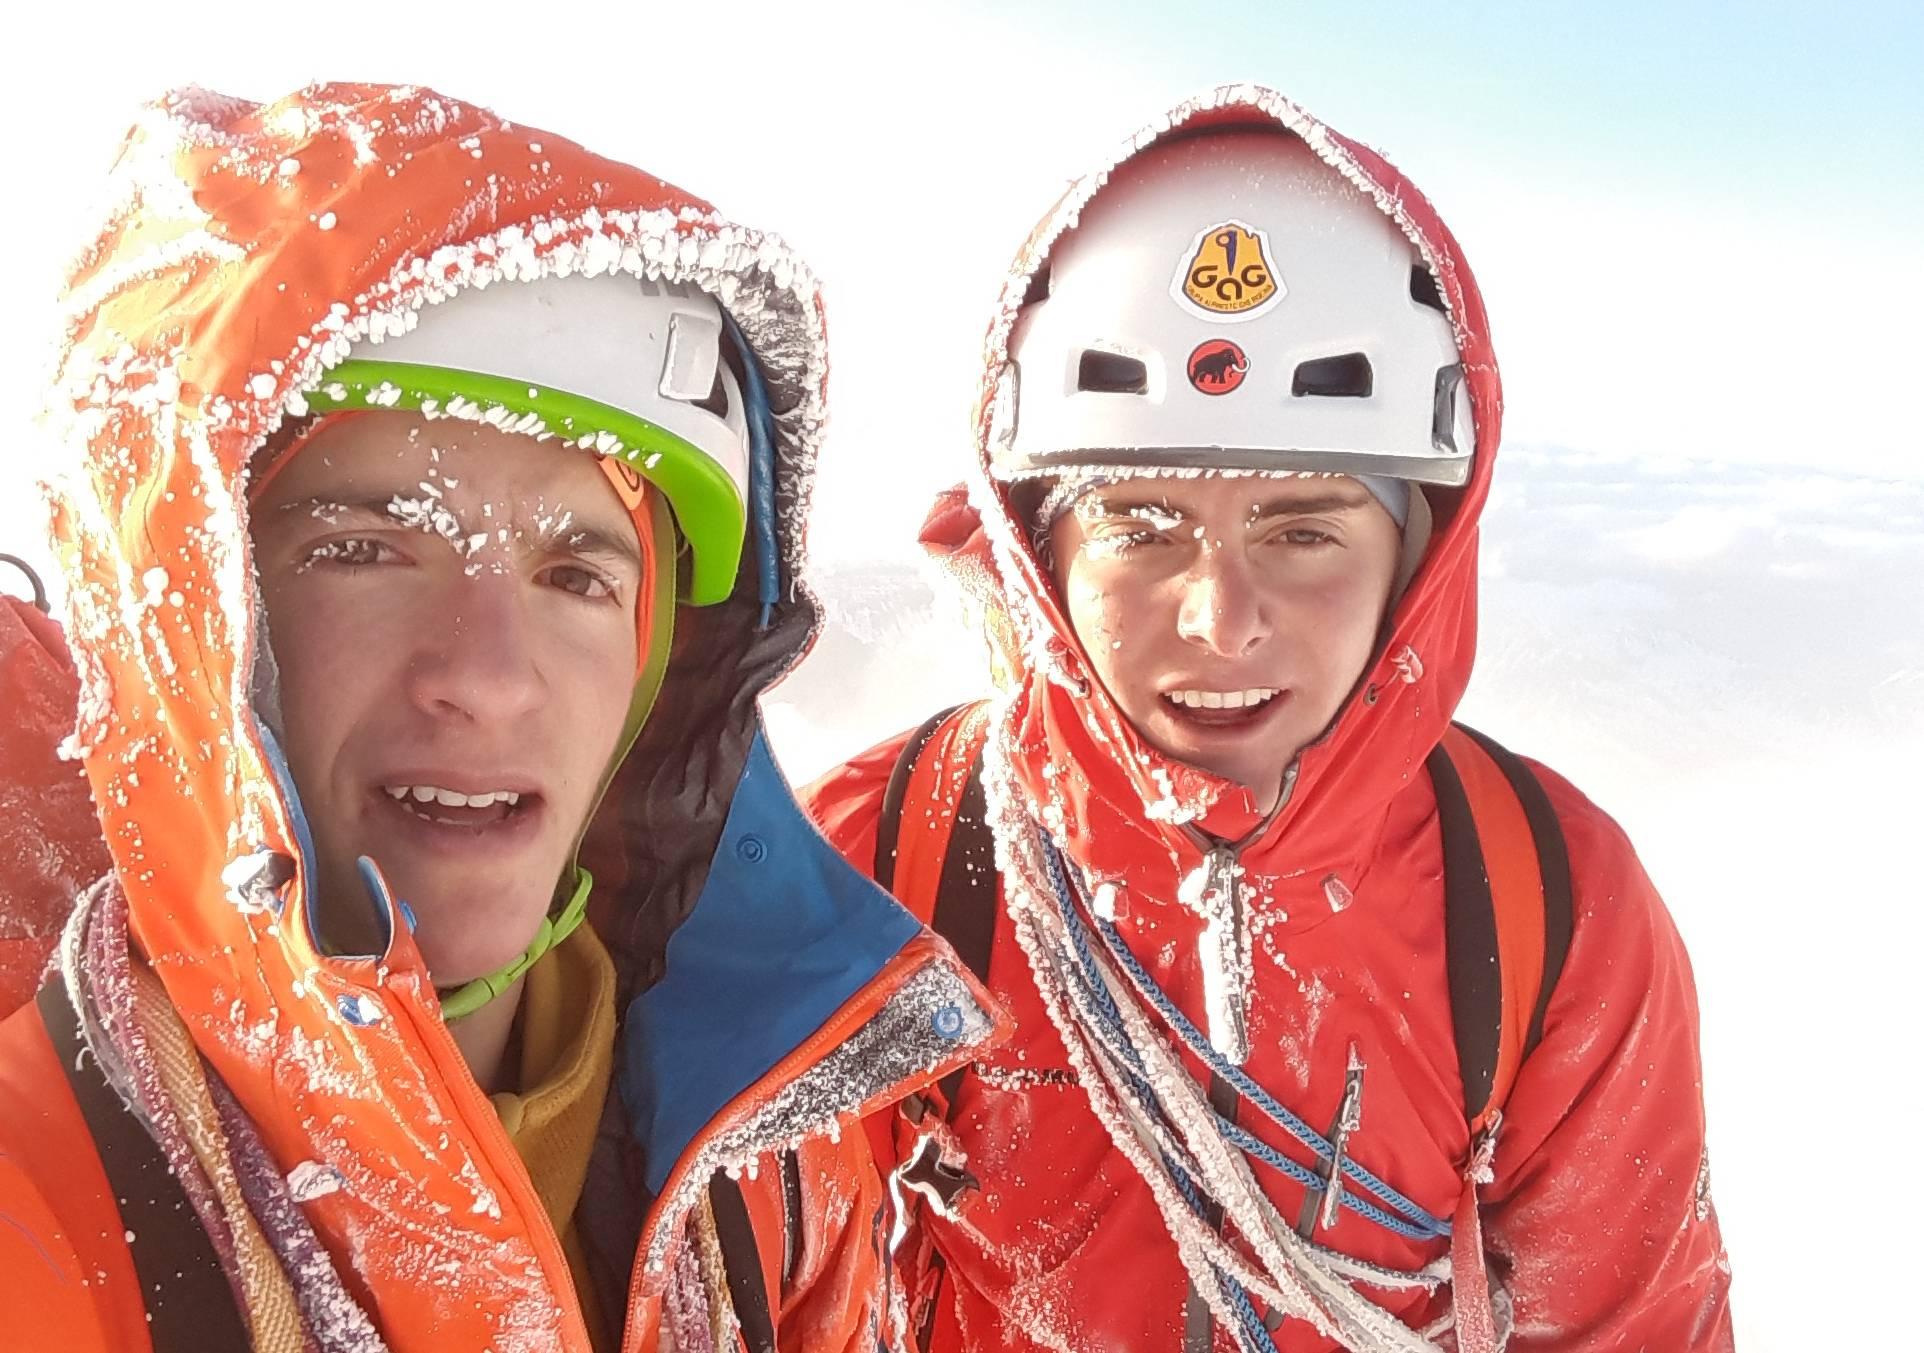 Photo of L'impresa dei 18enni Titus Prinoth e Janluca Kostner sulla nord dell'Eiger